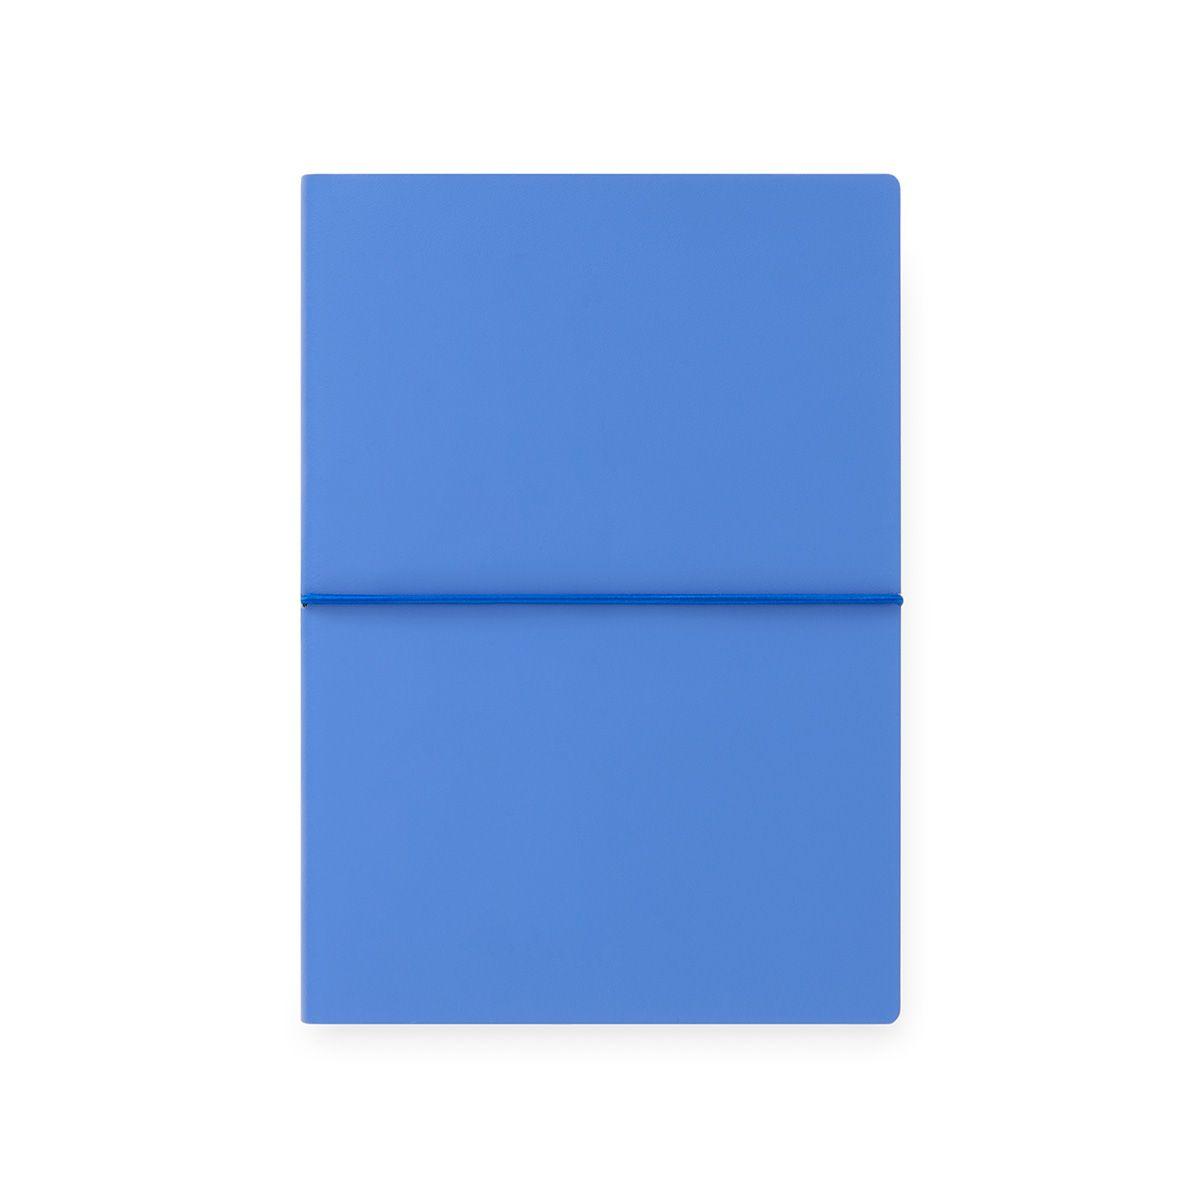 Notebook JORGEN Ordning and Reda